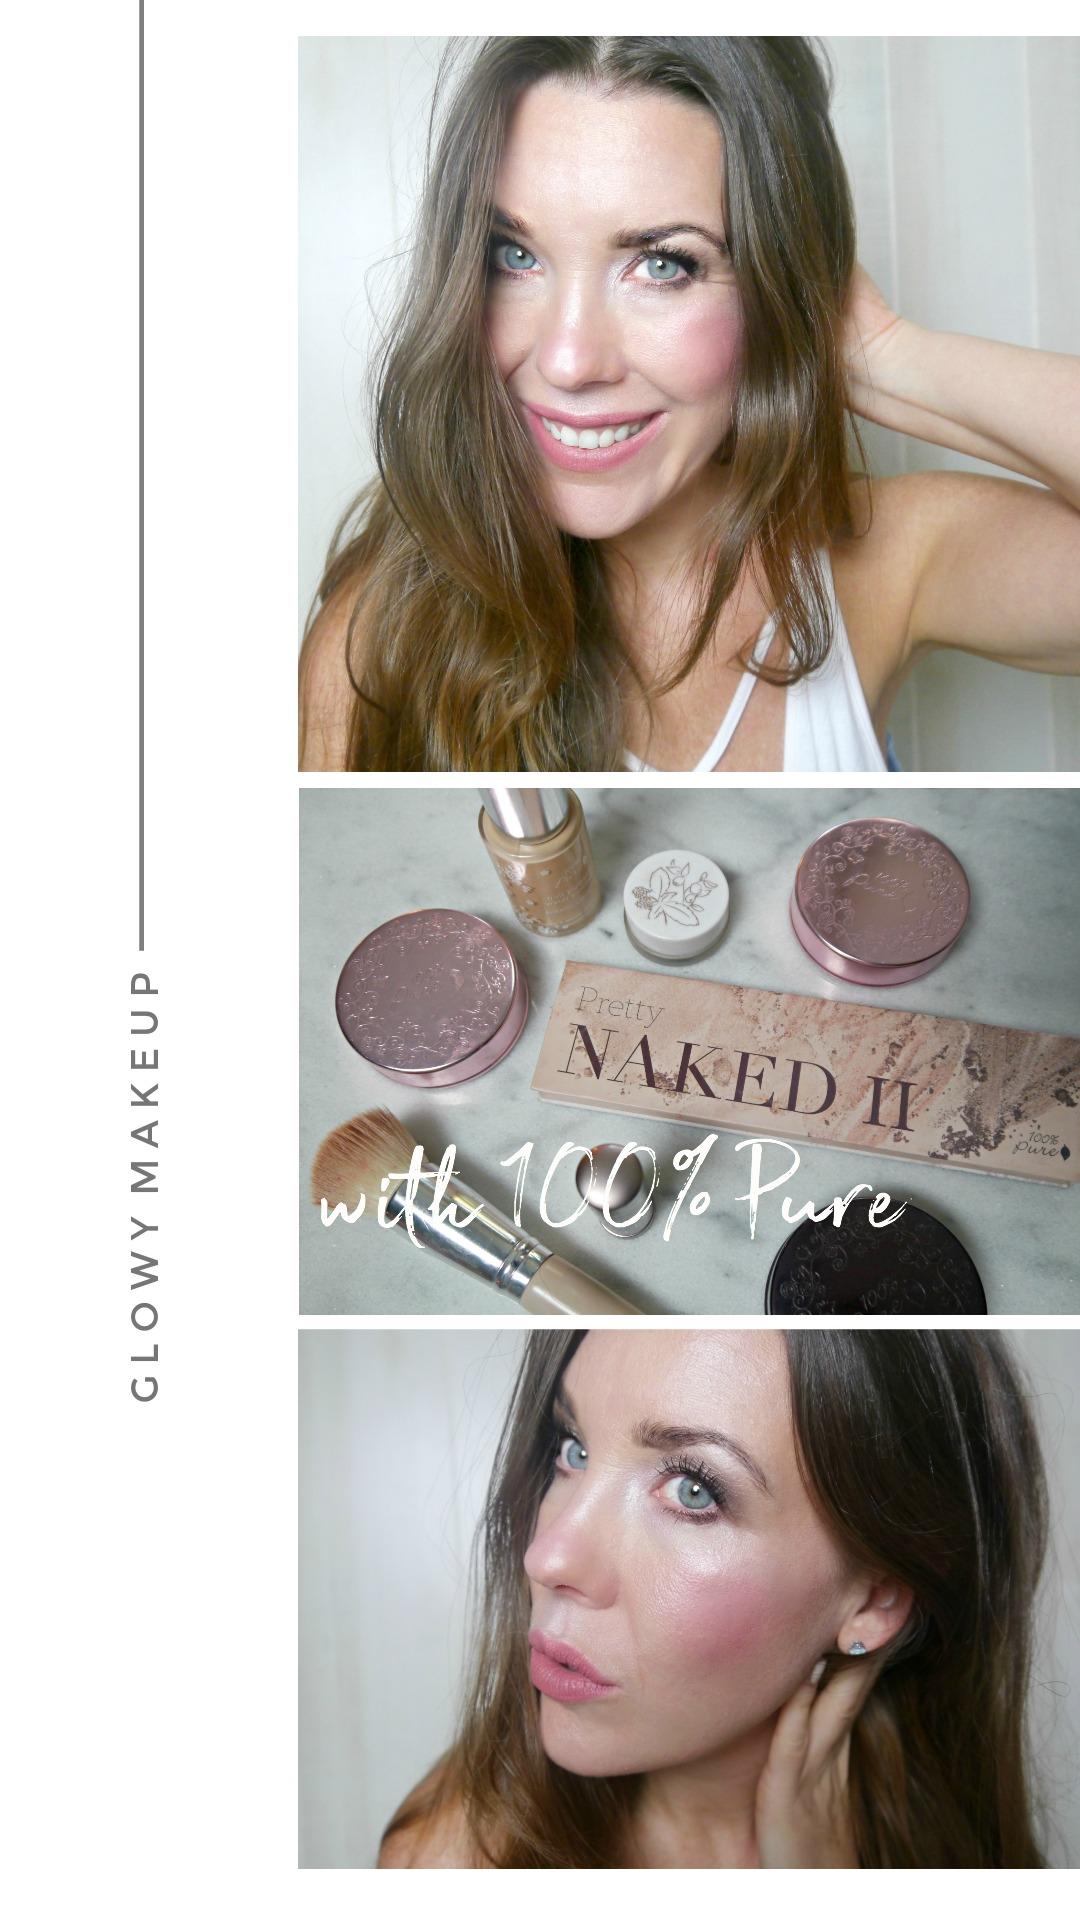 100% Pure Glowy Makeup